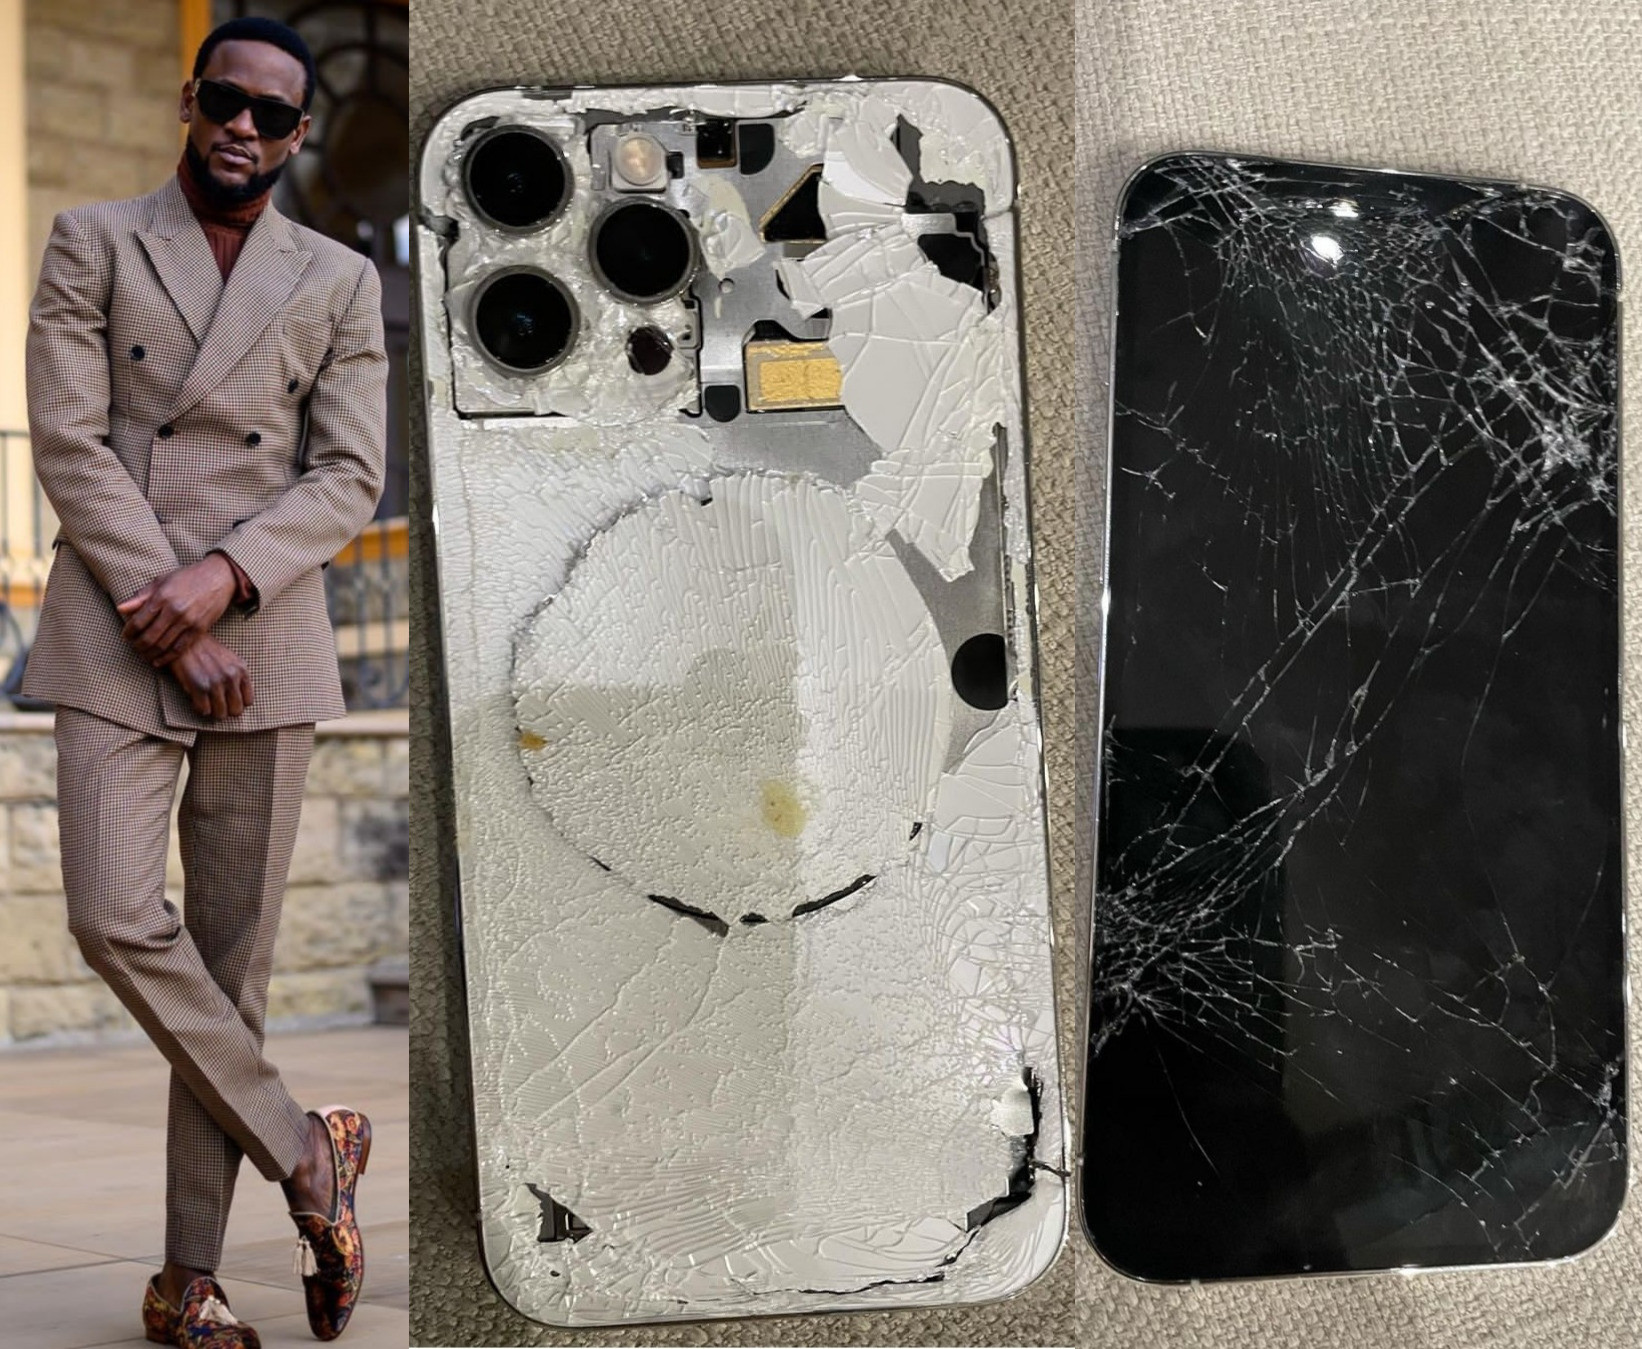 bbnaija star omashola recounts how he saved himself during robbery incident by gun wielding men 1